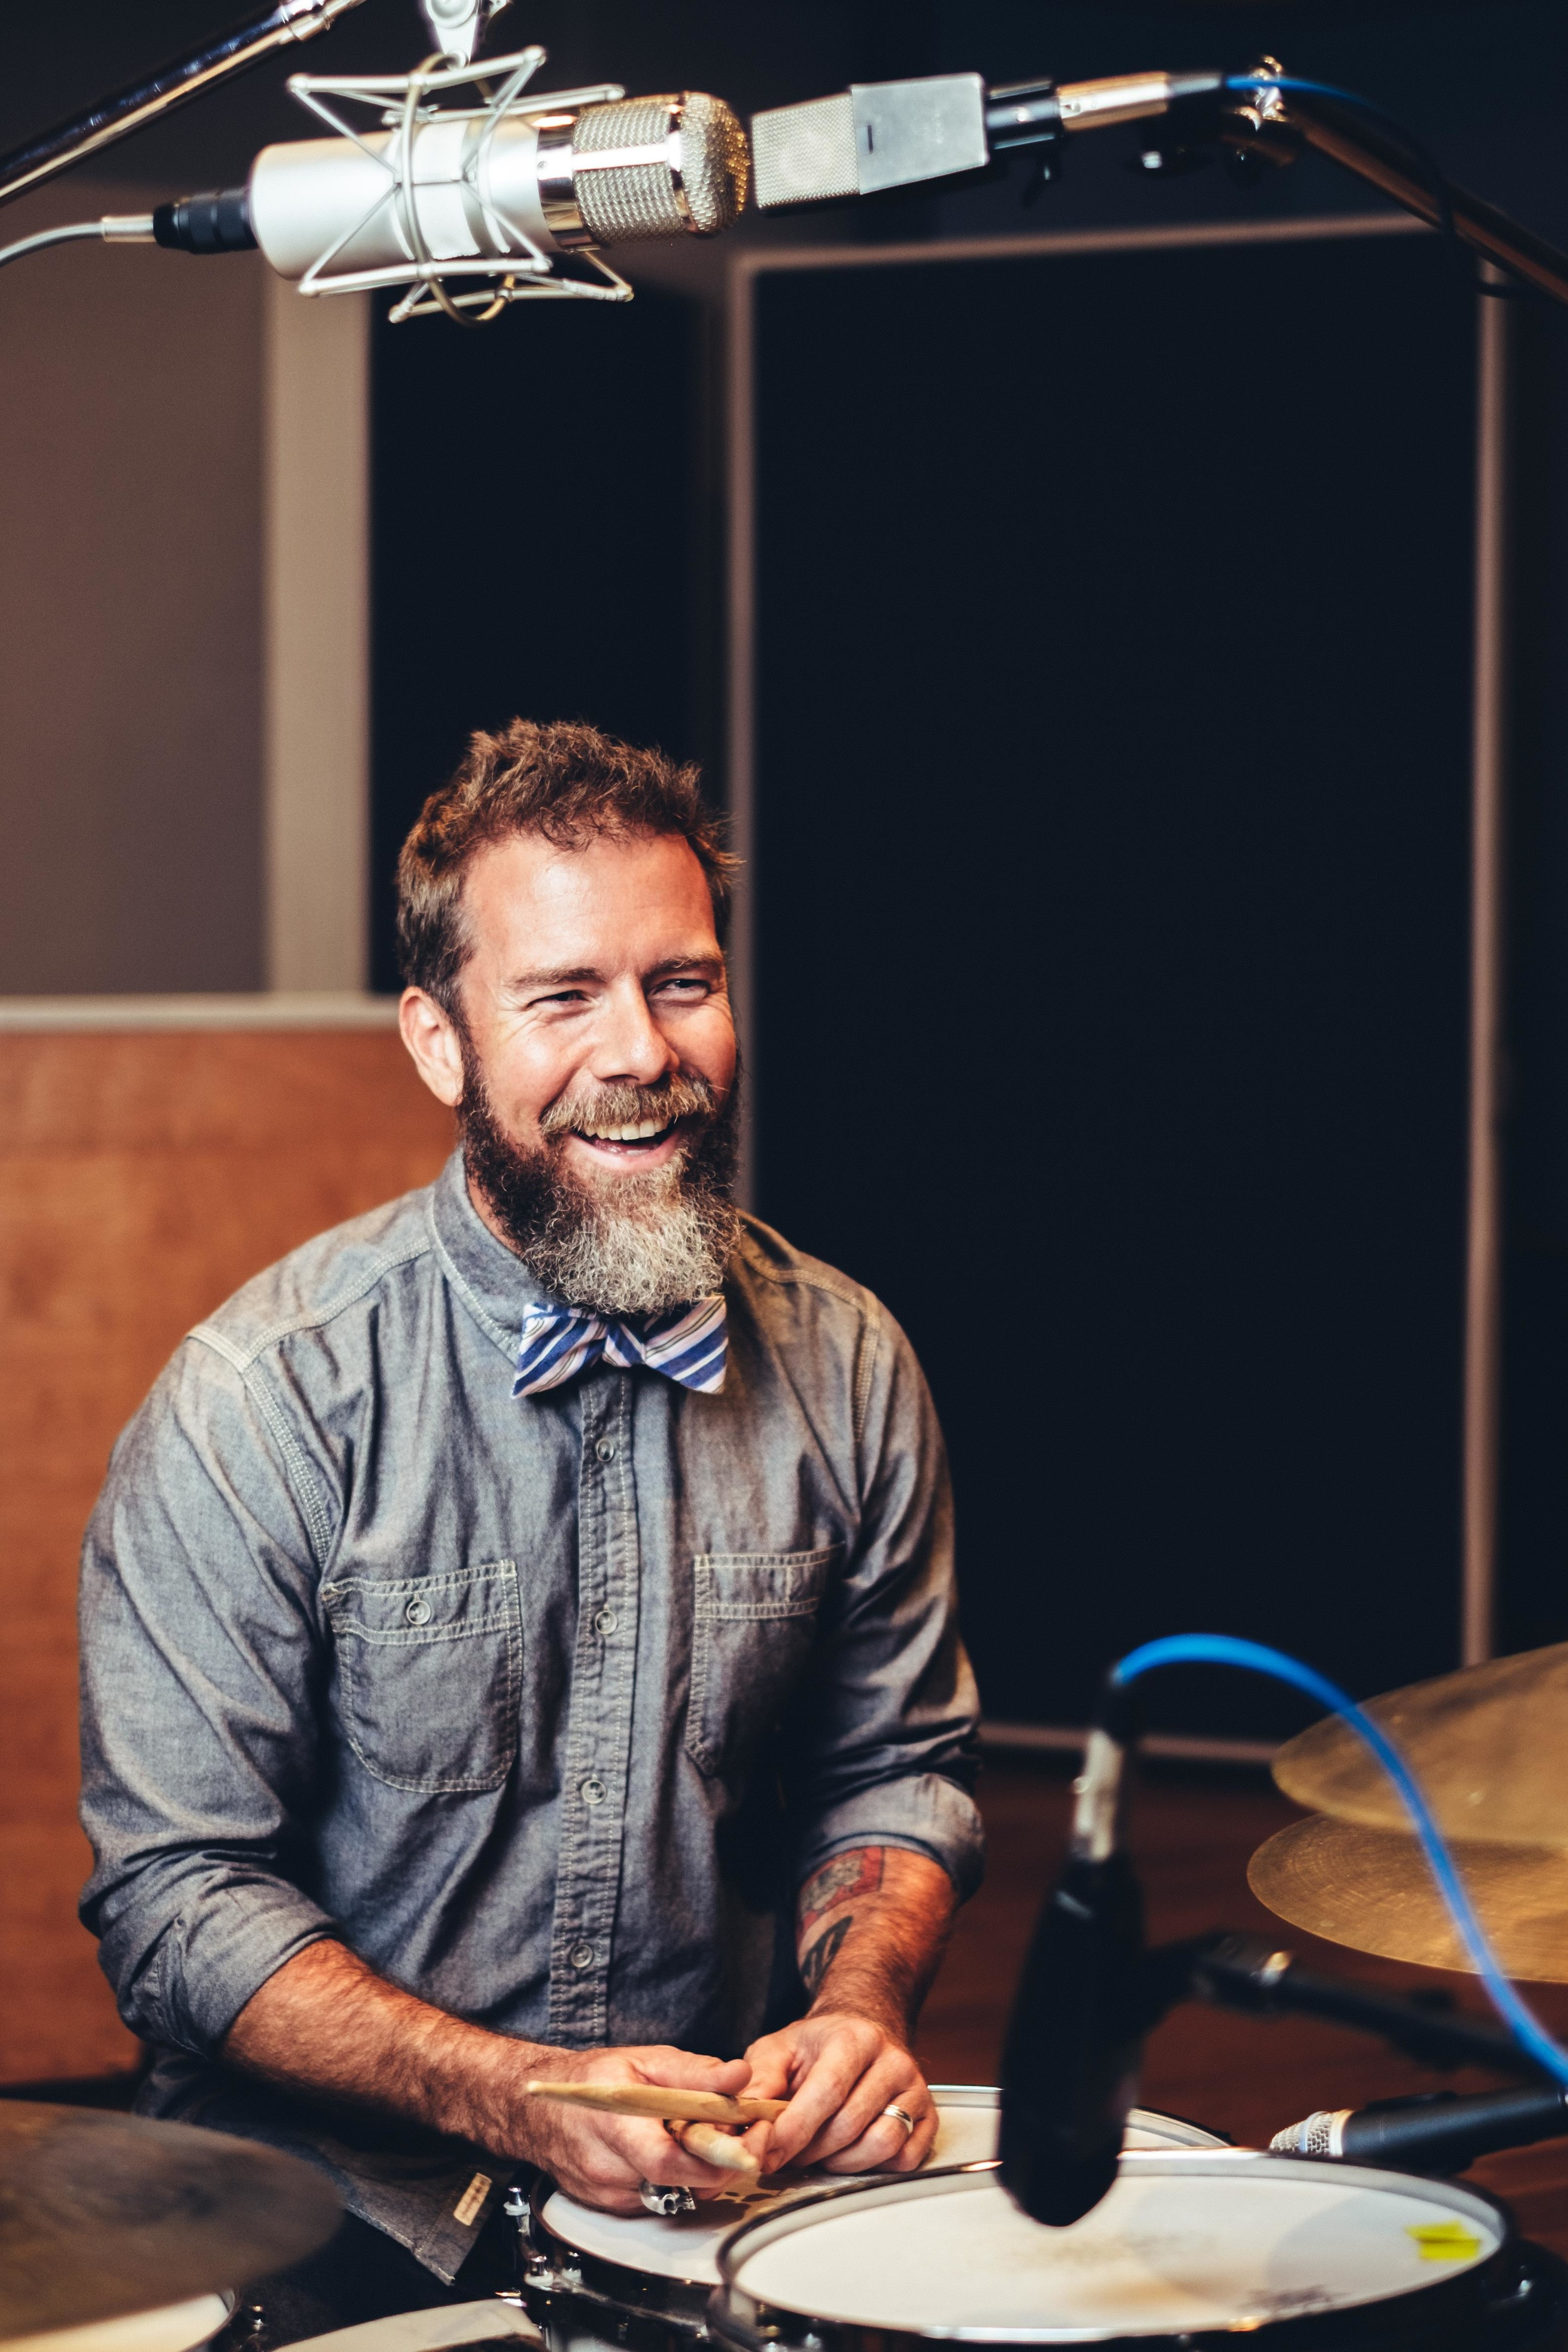 Jeremy Gilbertson